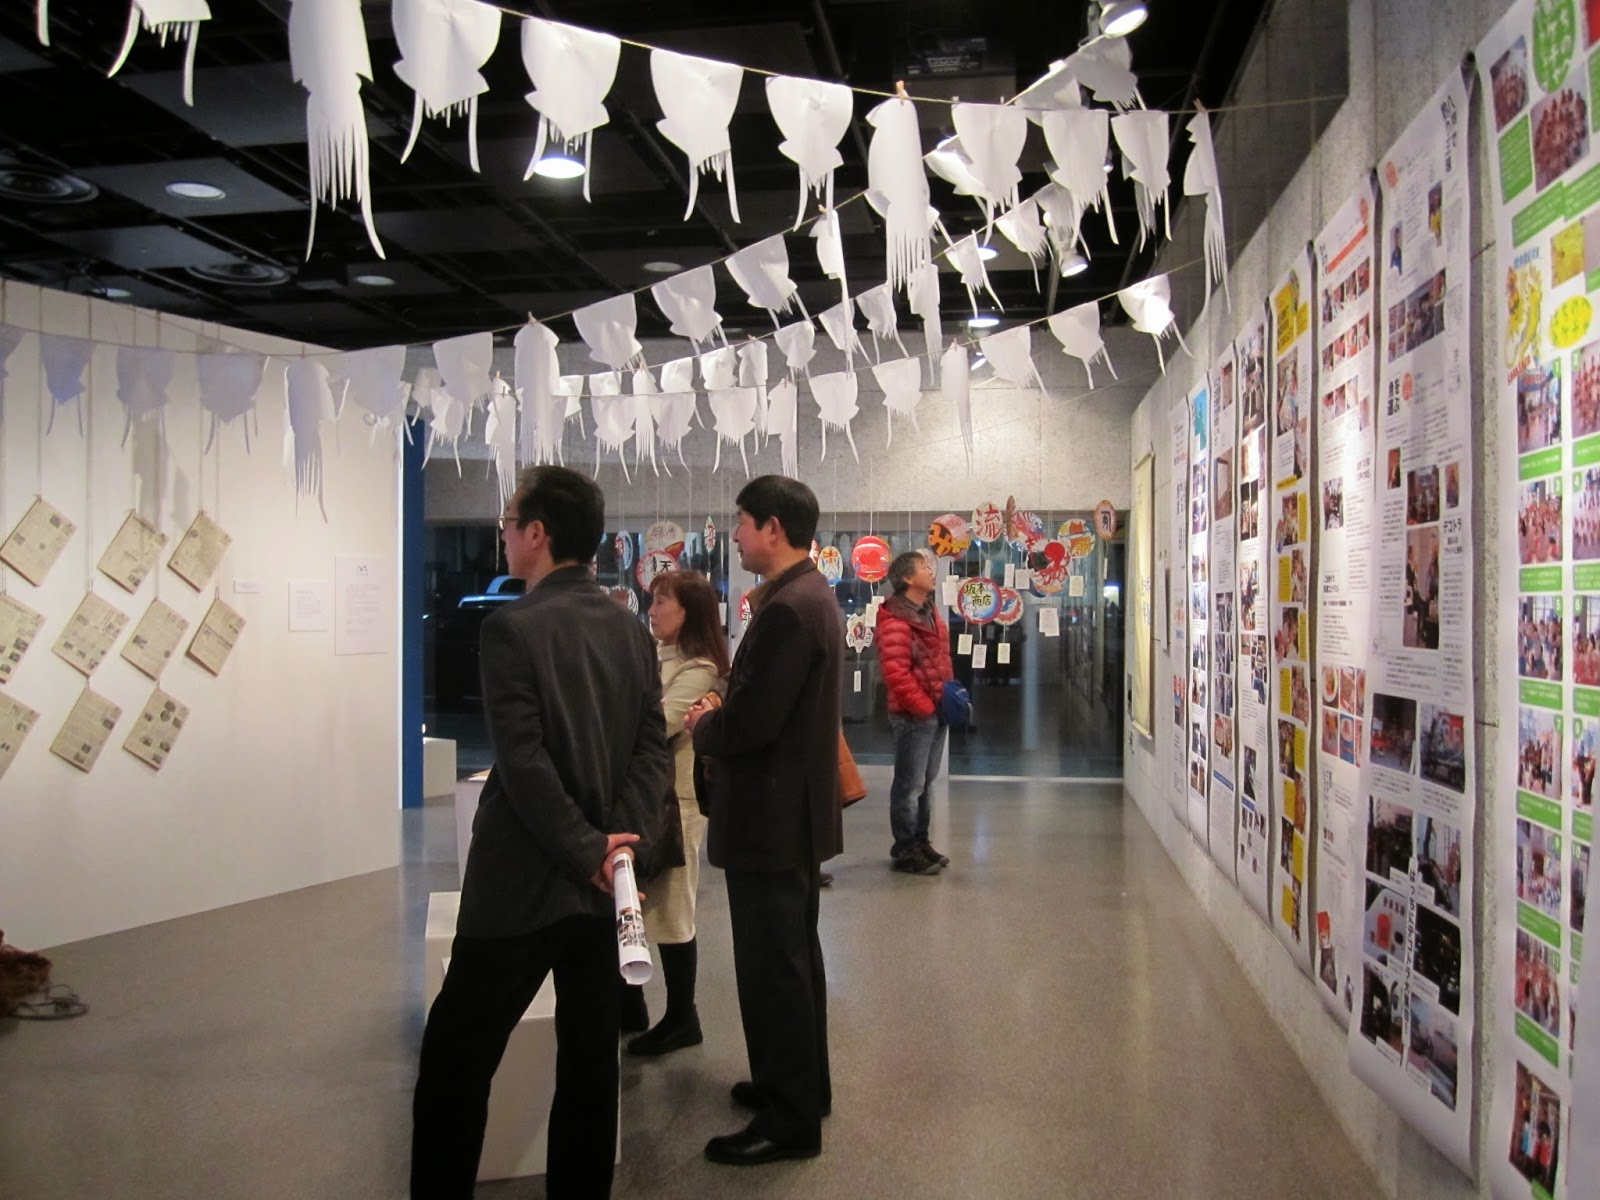 Tatsuki Masaru Gyojin Photography Exhibit Hachinohe Portal Museum Hacchi  田附 勝写真展 魚人(ぎょじん) 八戸ポータルミュージアムはっち